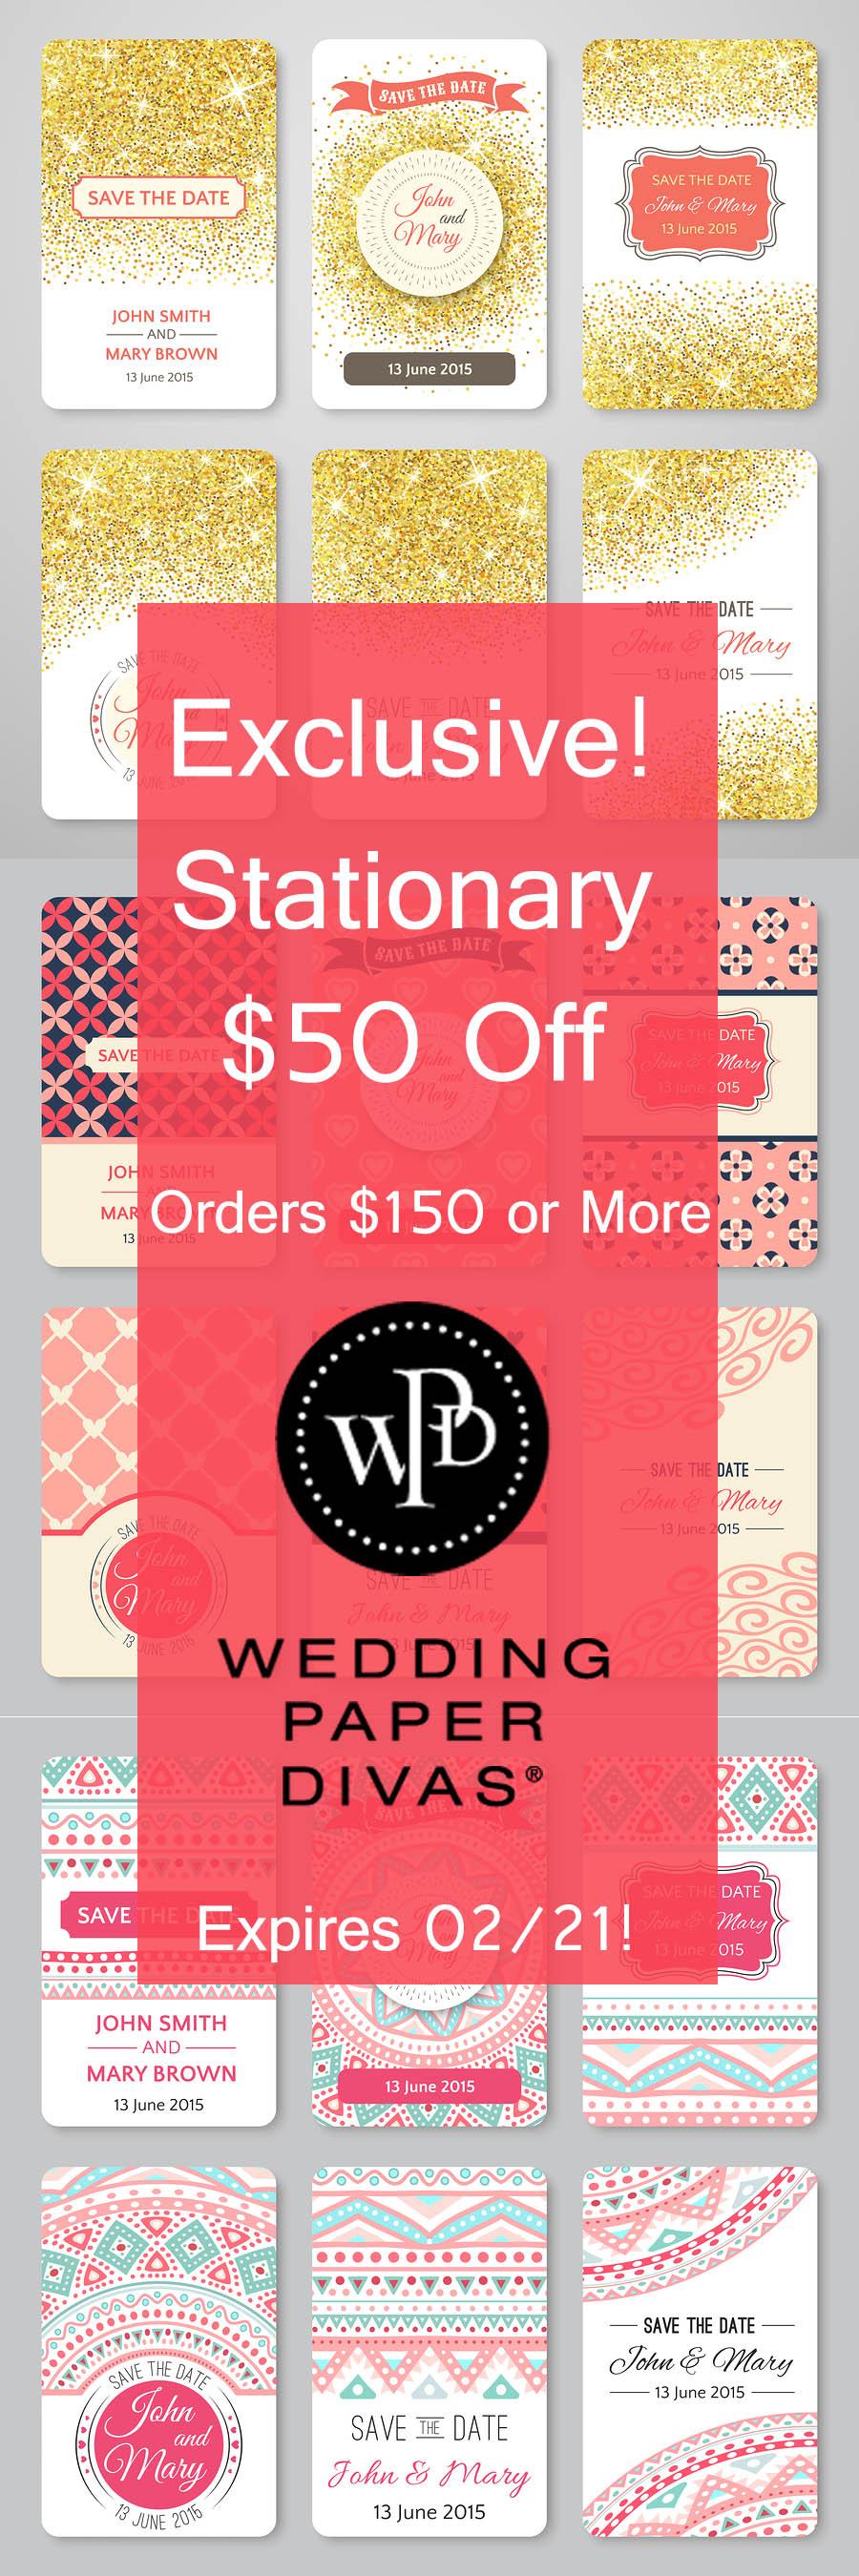 Attractive Wedding Paper Divas Gift Certificate Code Collection ...